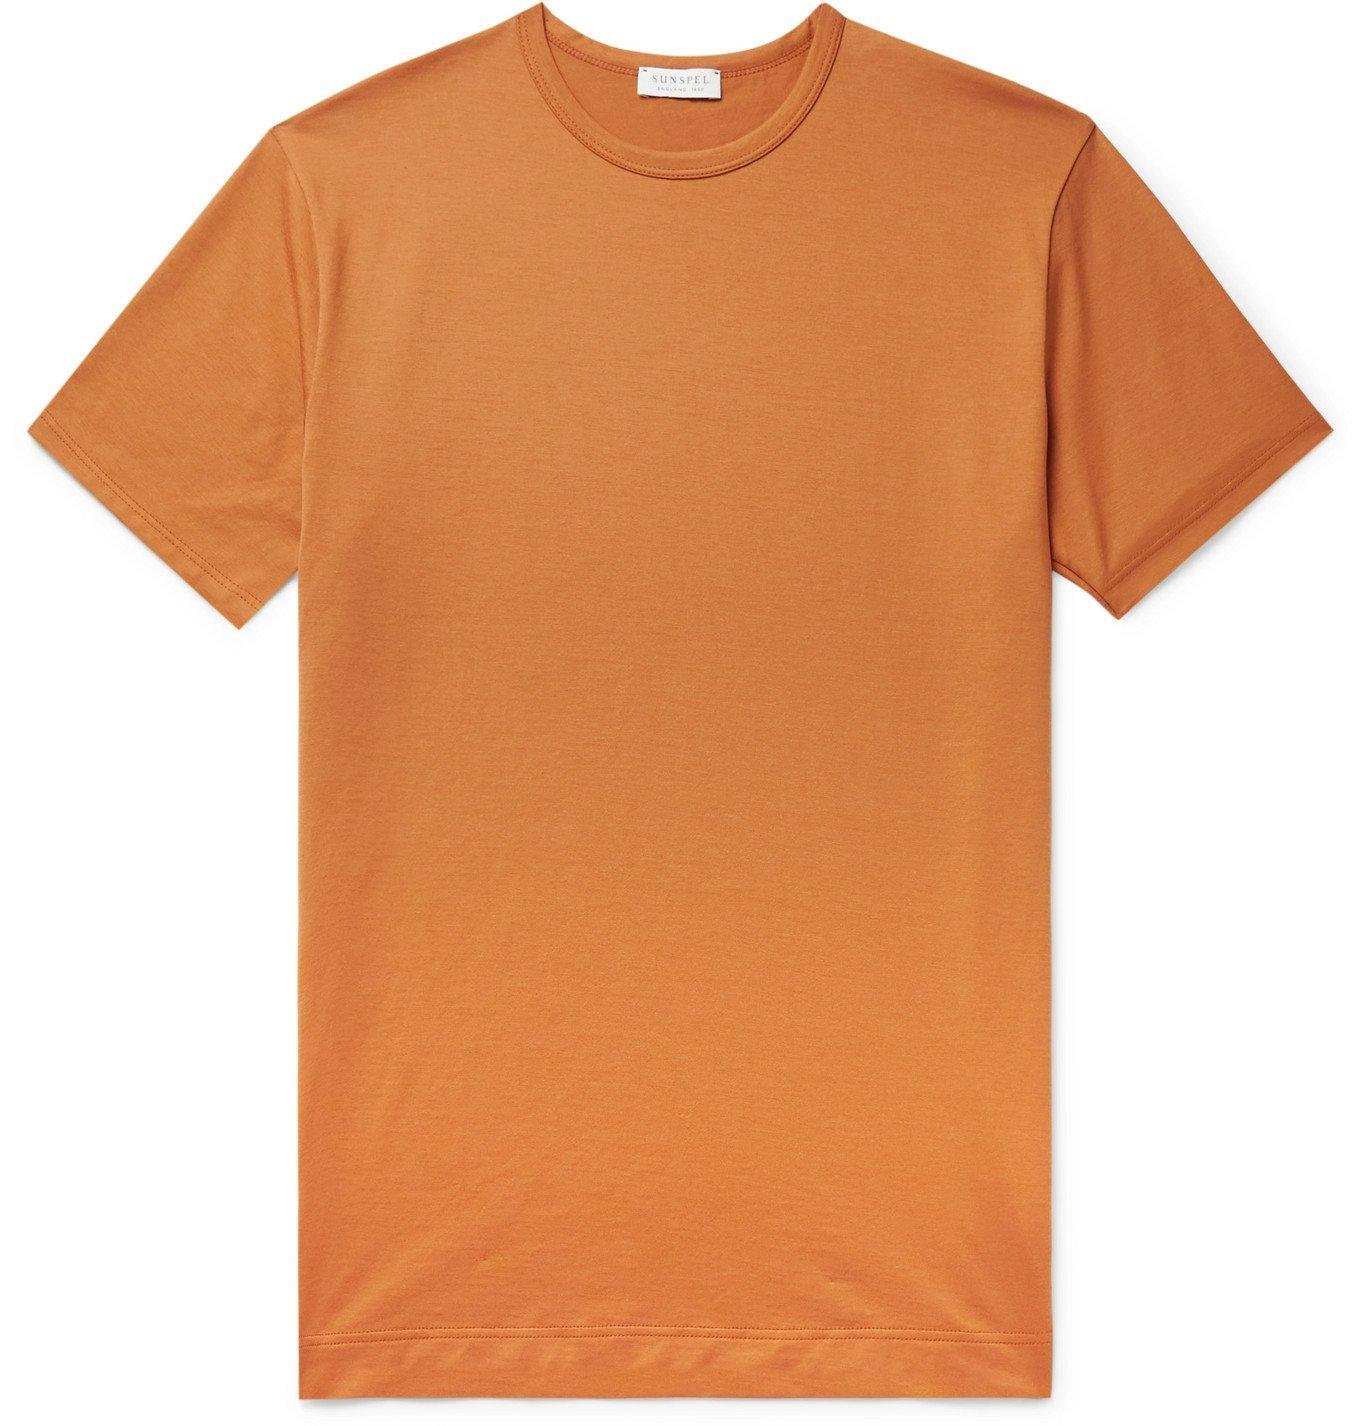 SUNSPEL - Slim-Fit Cotton-Jersey T-Shirt - Orange